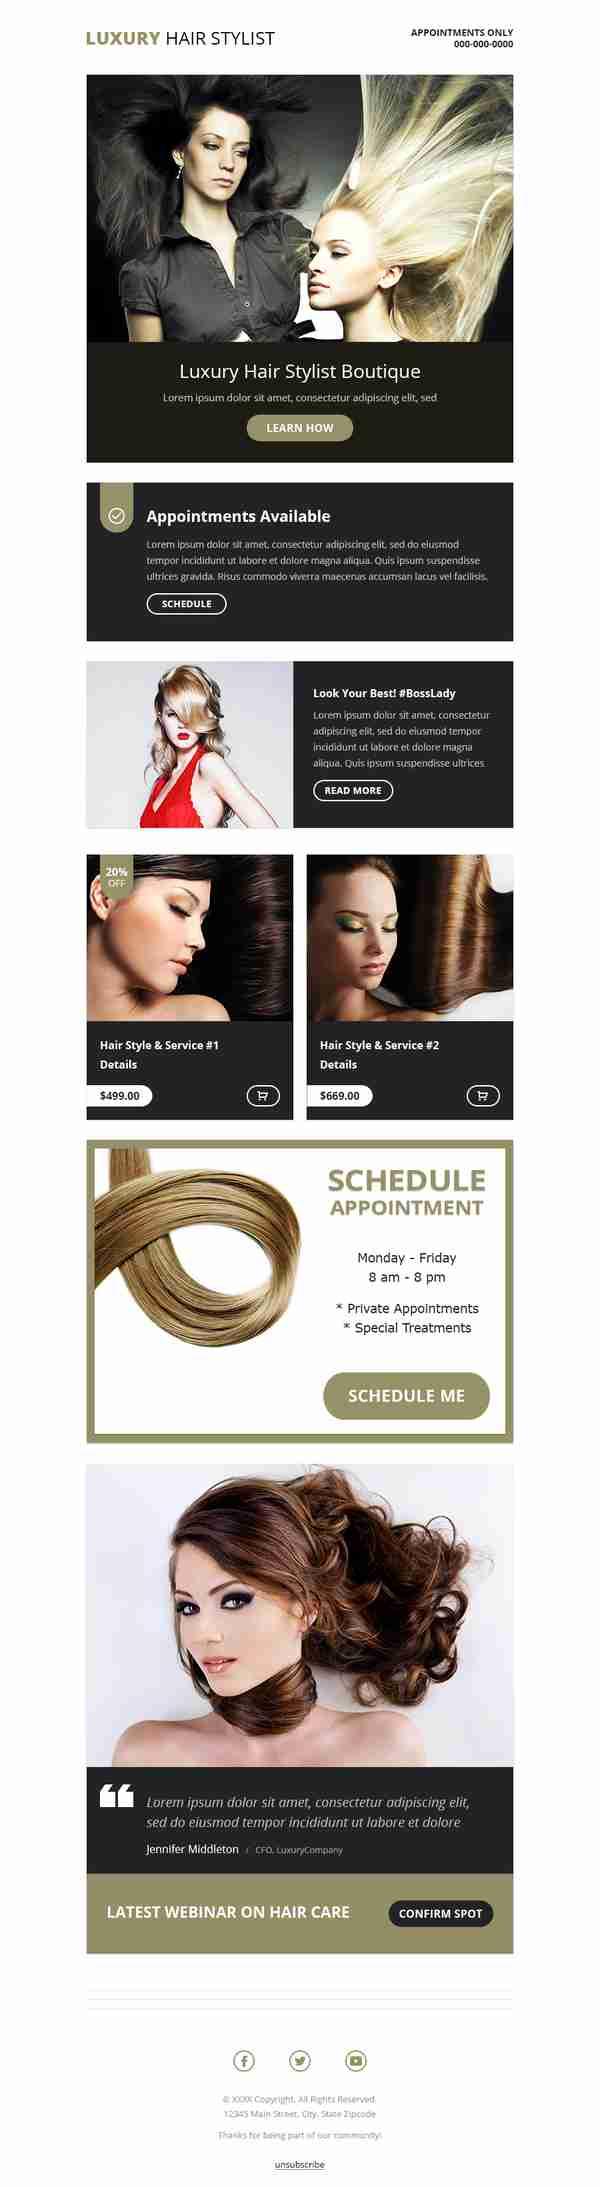 Email Marketing Design for Hair Stylists & Salons Industry - SKU: EM0702 - 247101